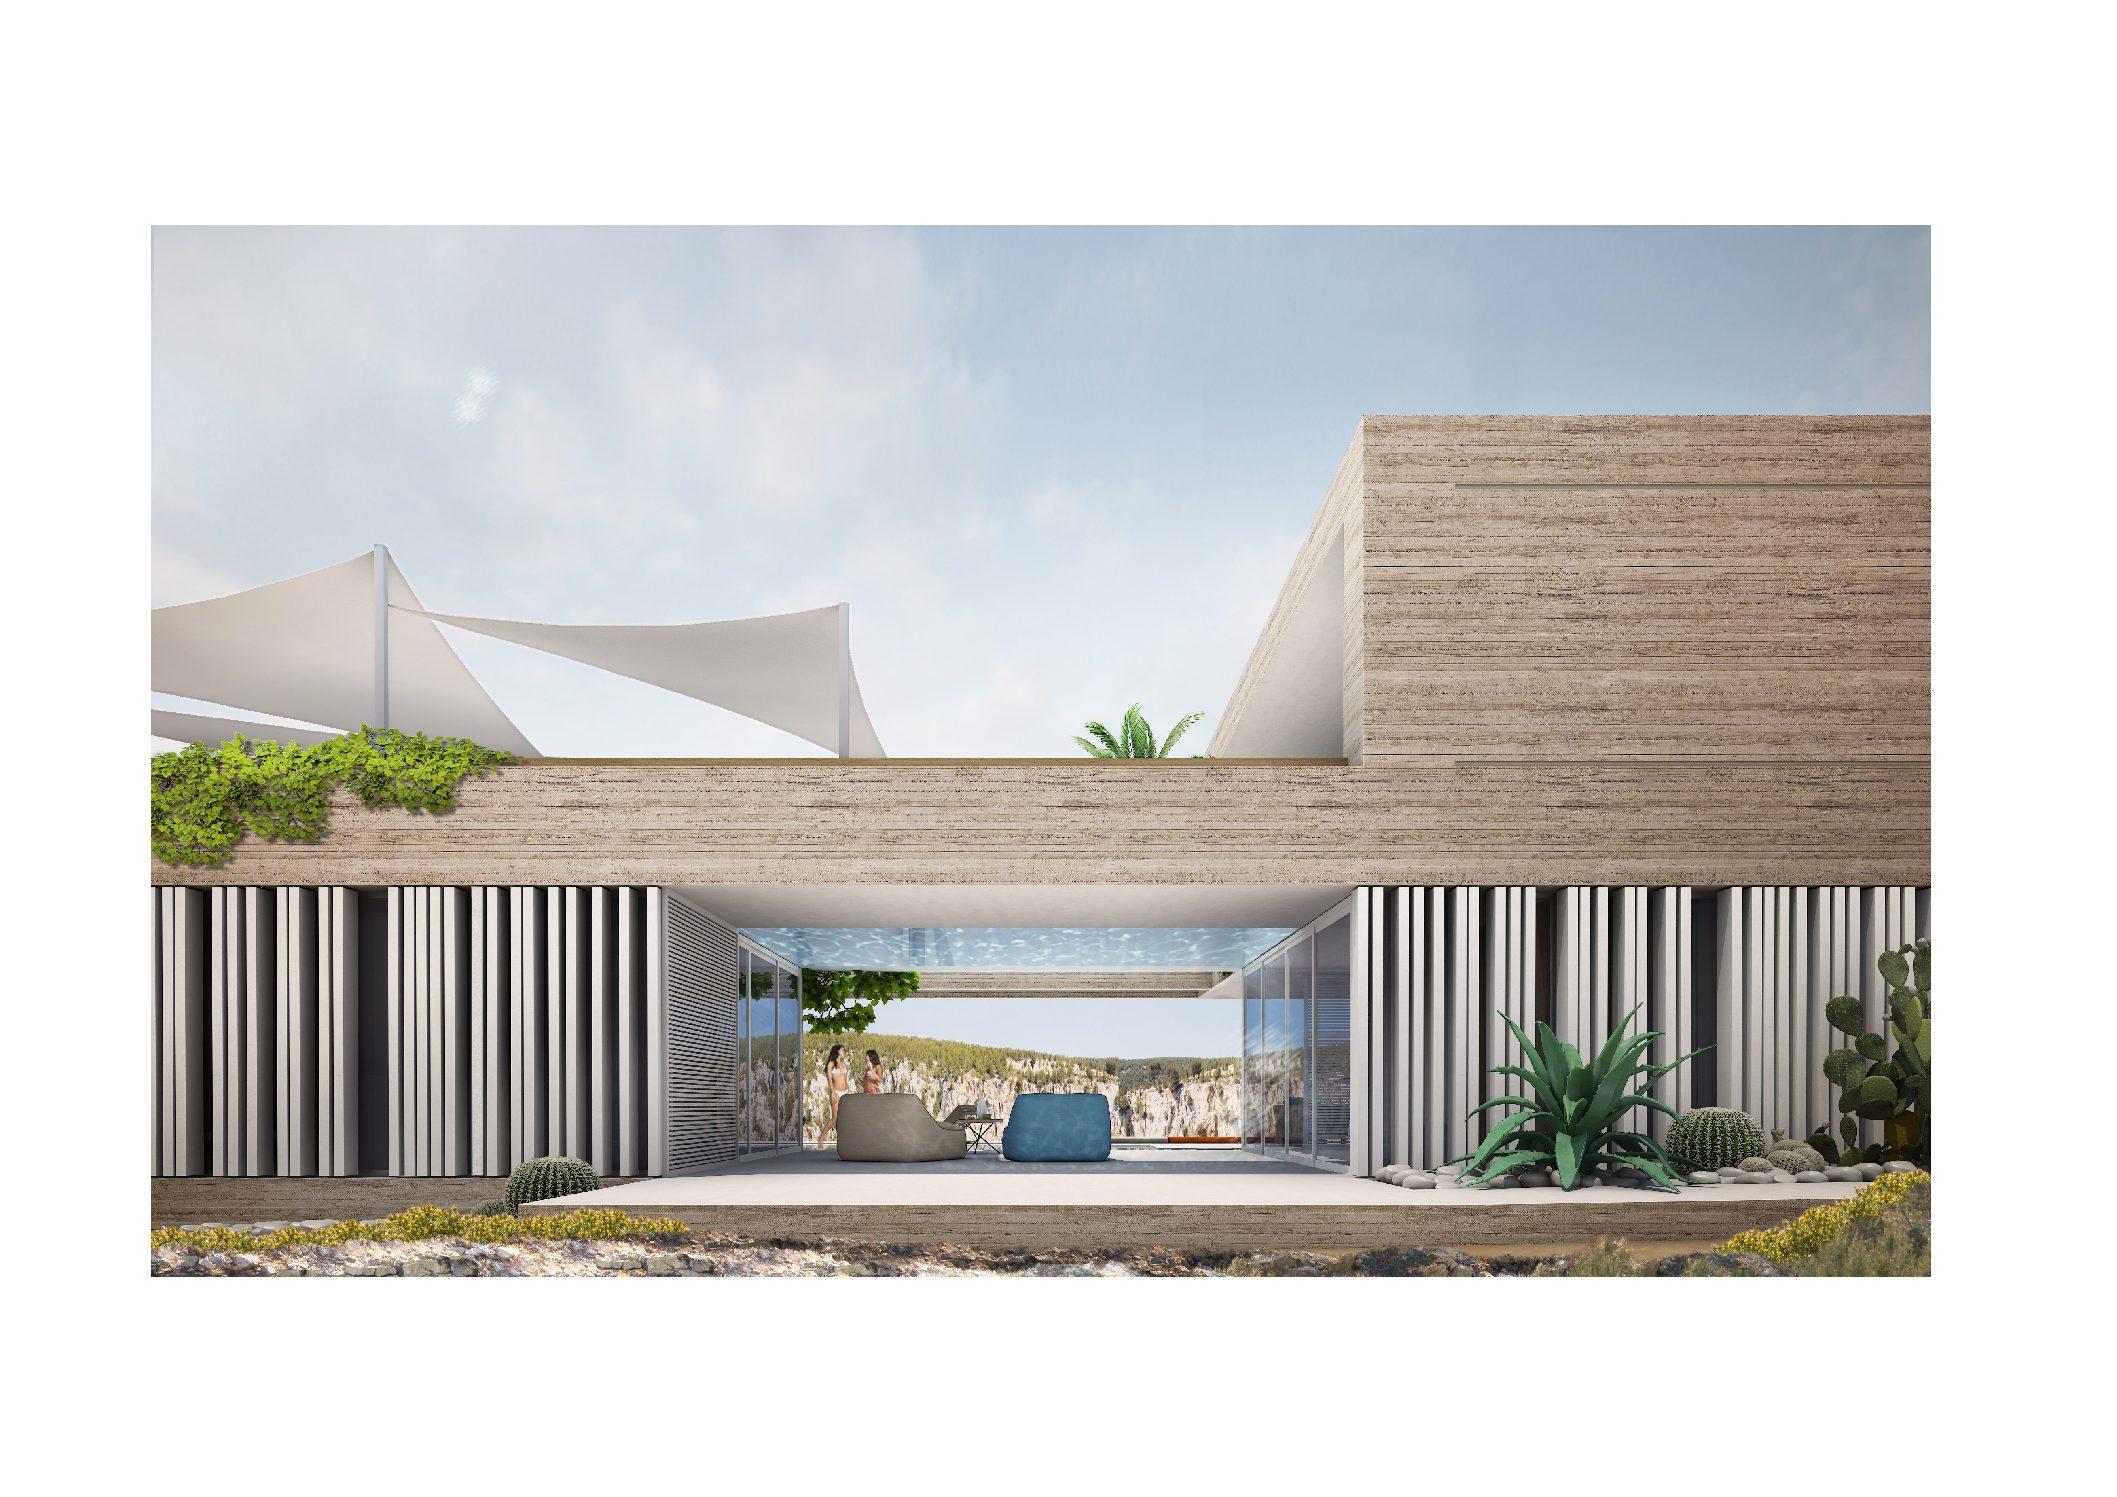 Architecture54_Cassis_02